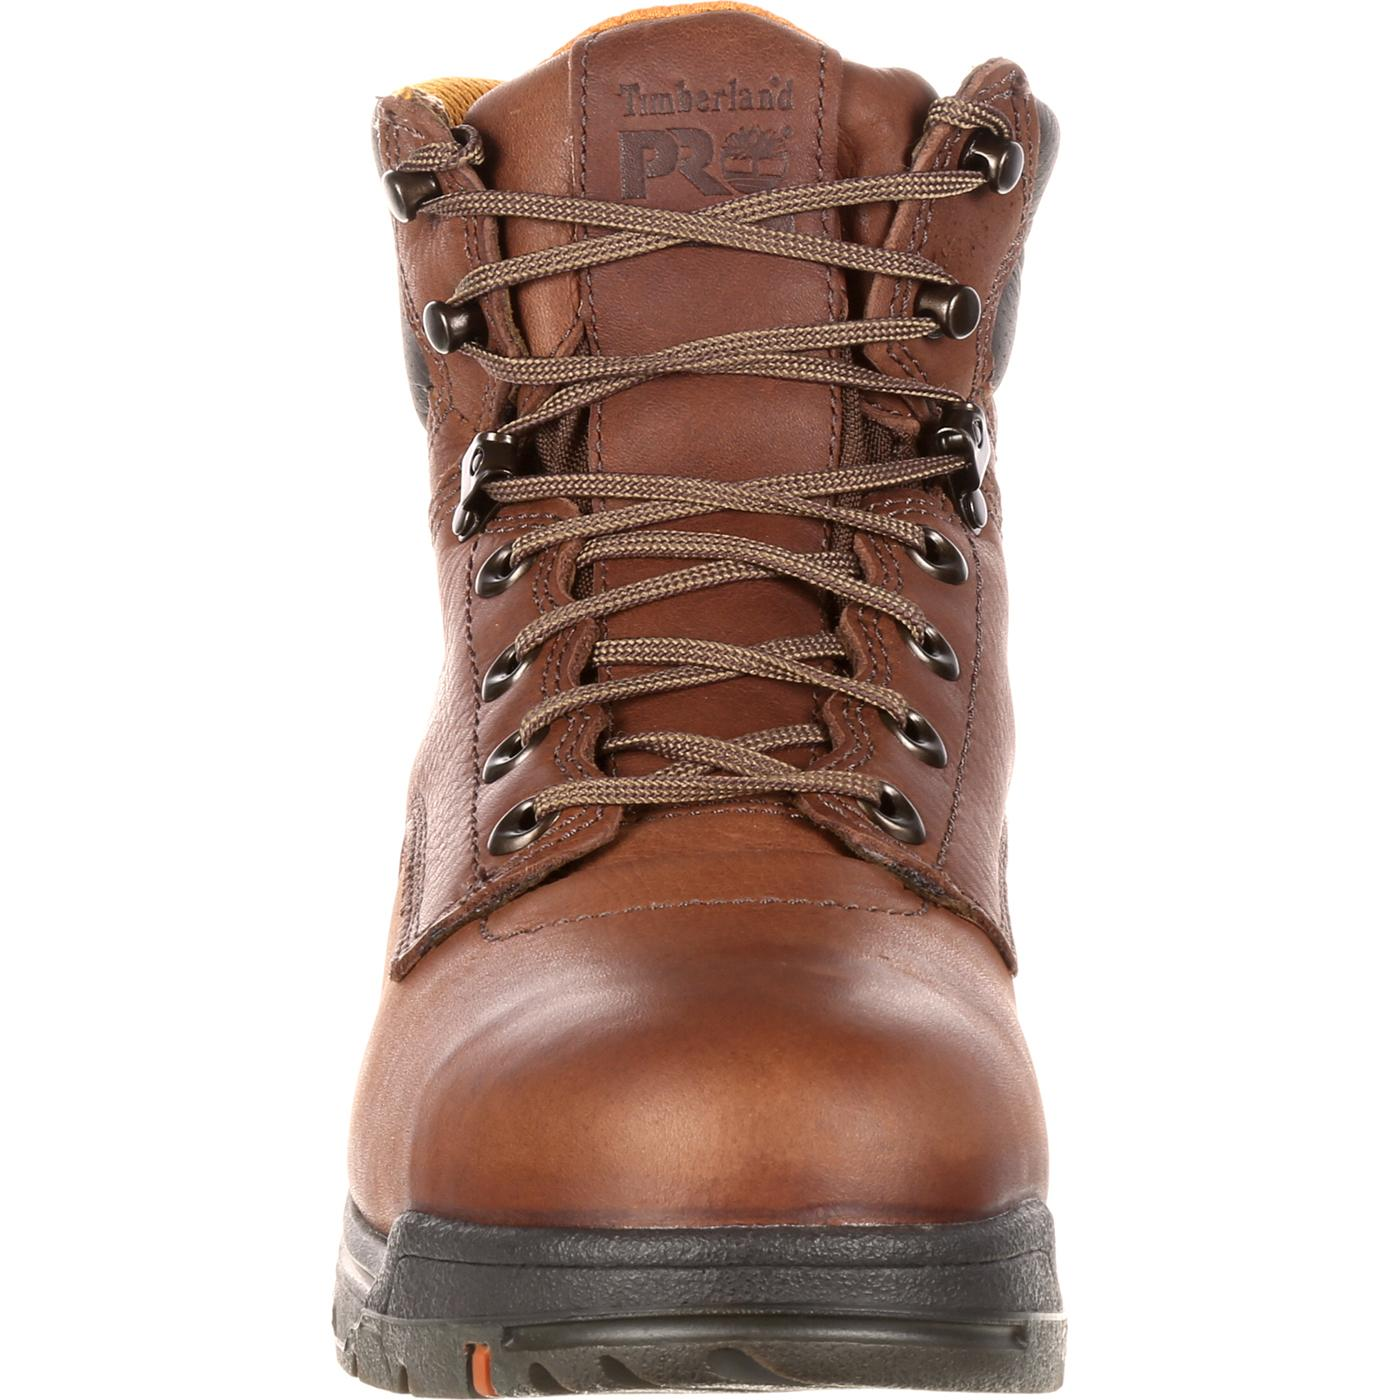 31797544156 Timberland PRO TiTAN Alloy Toe Sport Work Boot